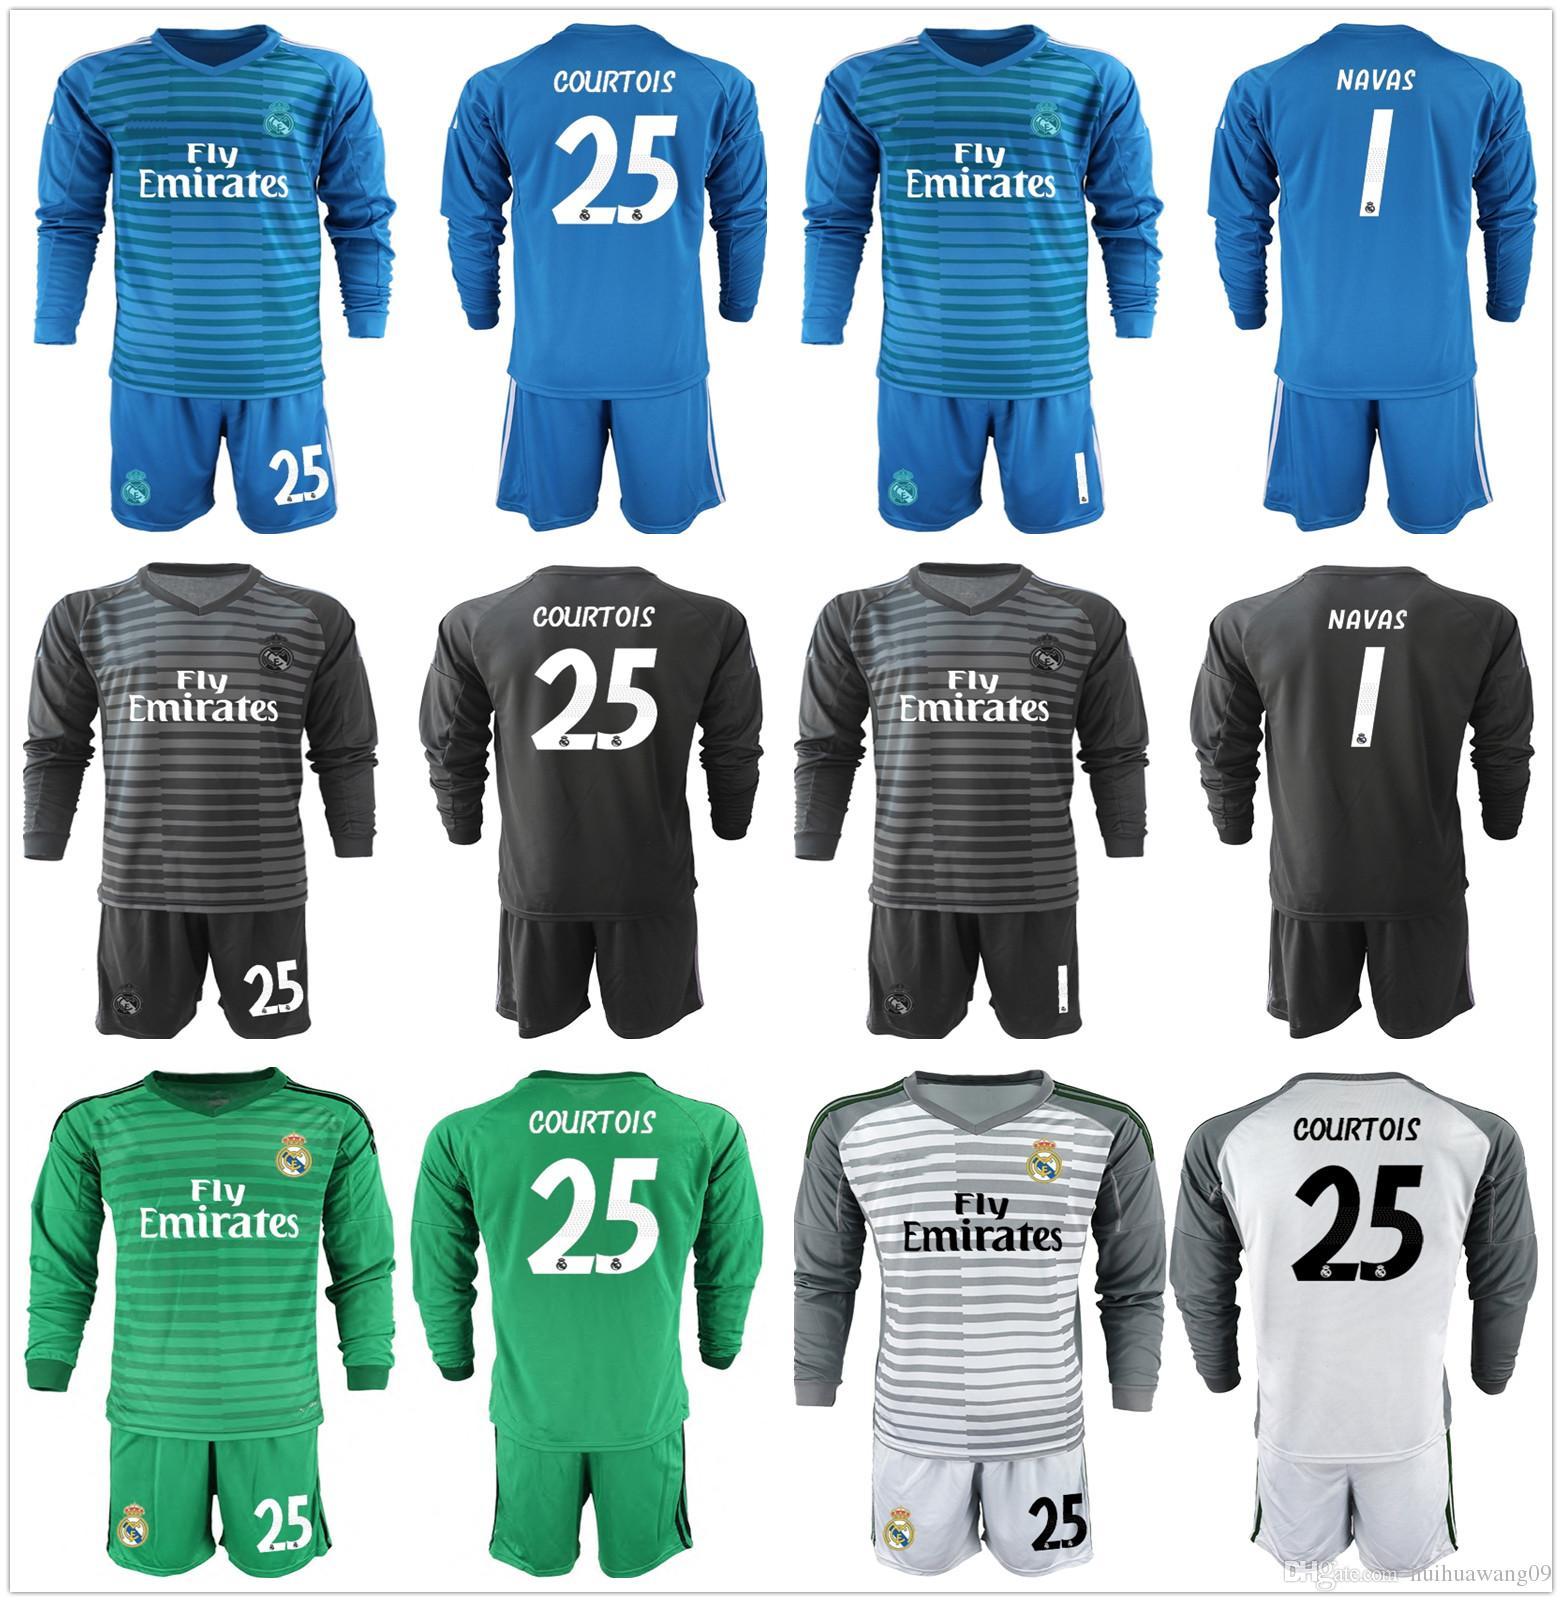 Compre 2018 2019 Longa Manga Real Madrid Conjunto De Futebol Goalkeepe Kit  Keylor Navas 25 Courtois Goleiro Madrid Jersey Bale Camisa Uniforme De  Futebol ... 08b09c122b9c8